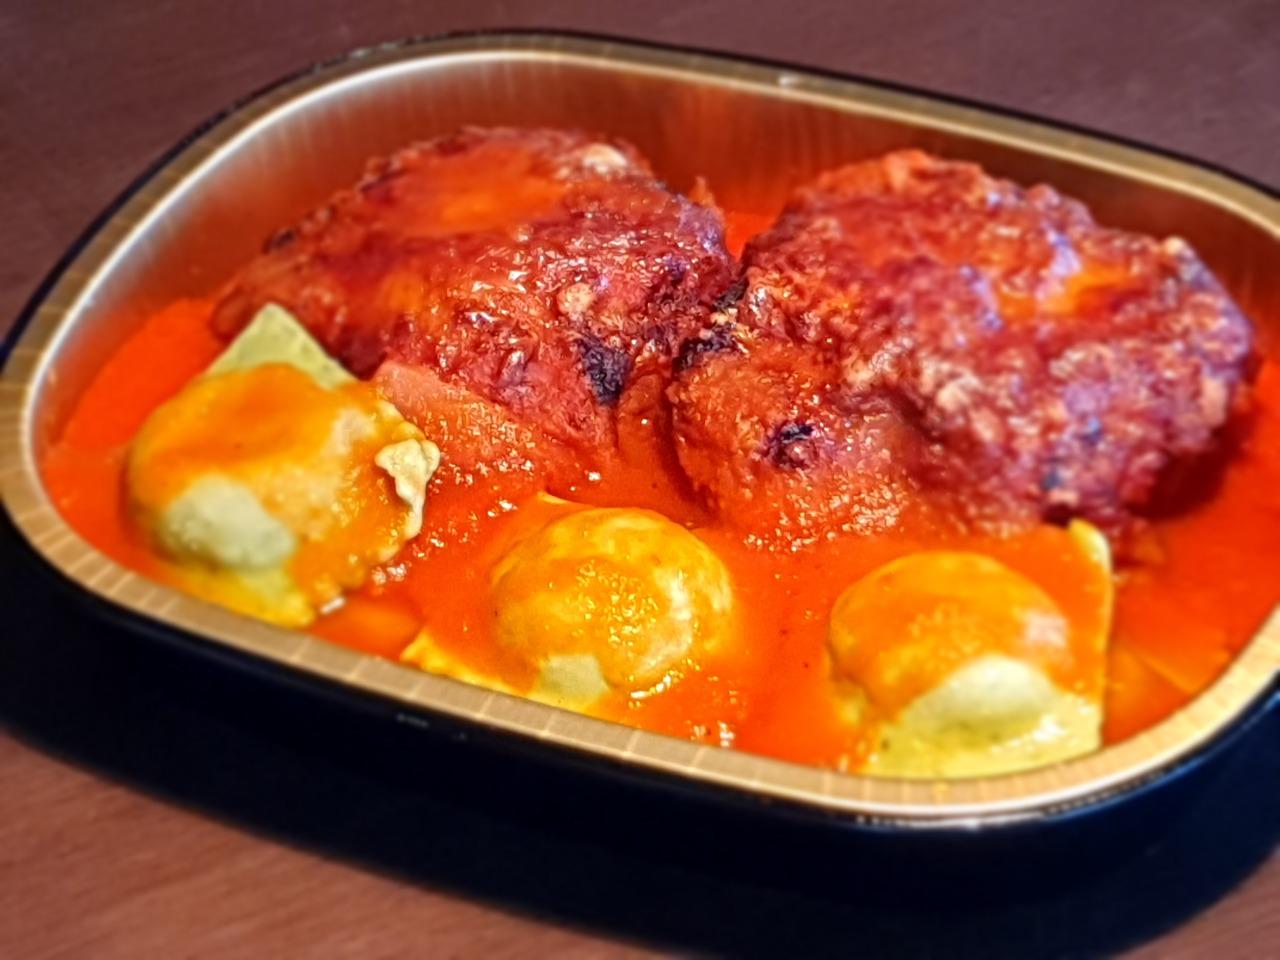 Congelados Terrazza 40, pratos prontos para ir ao forno ou ao micro-ondas.